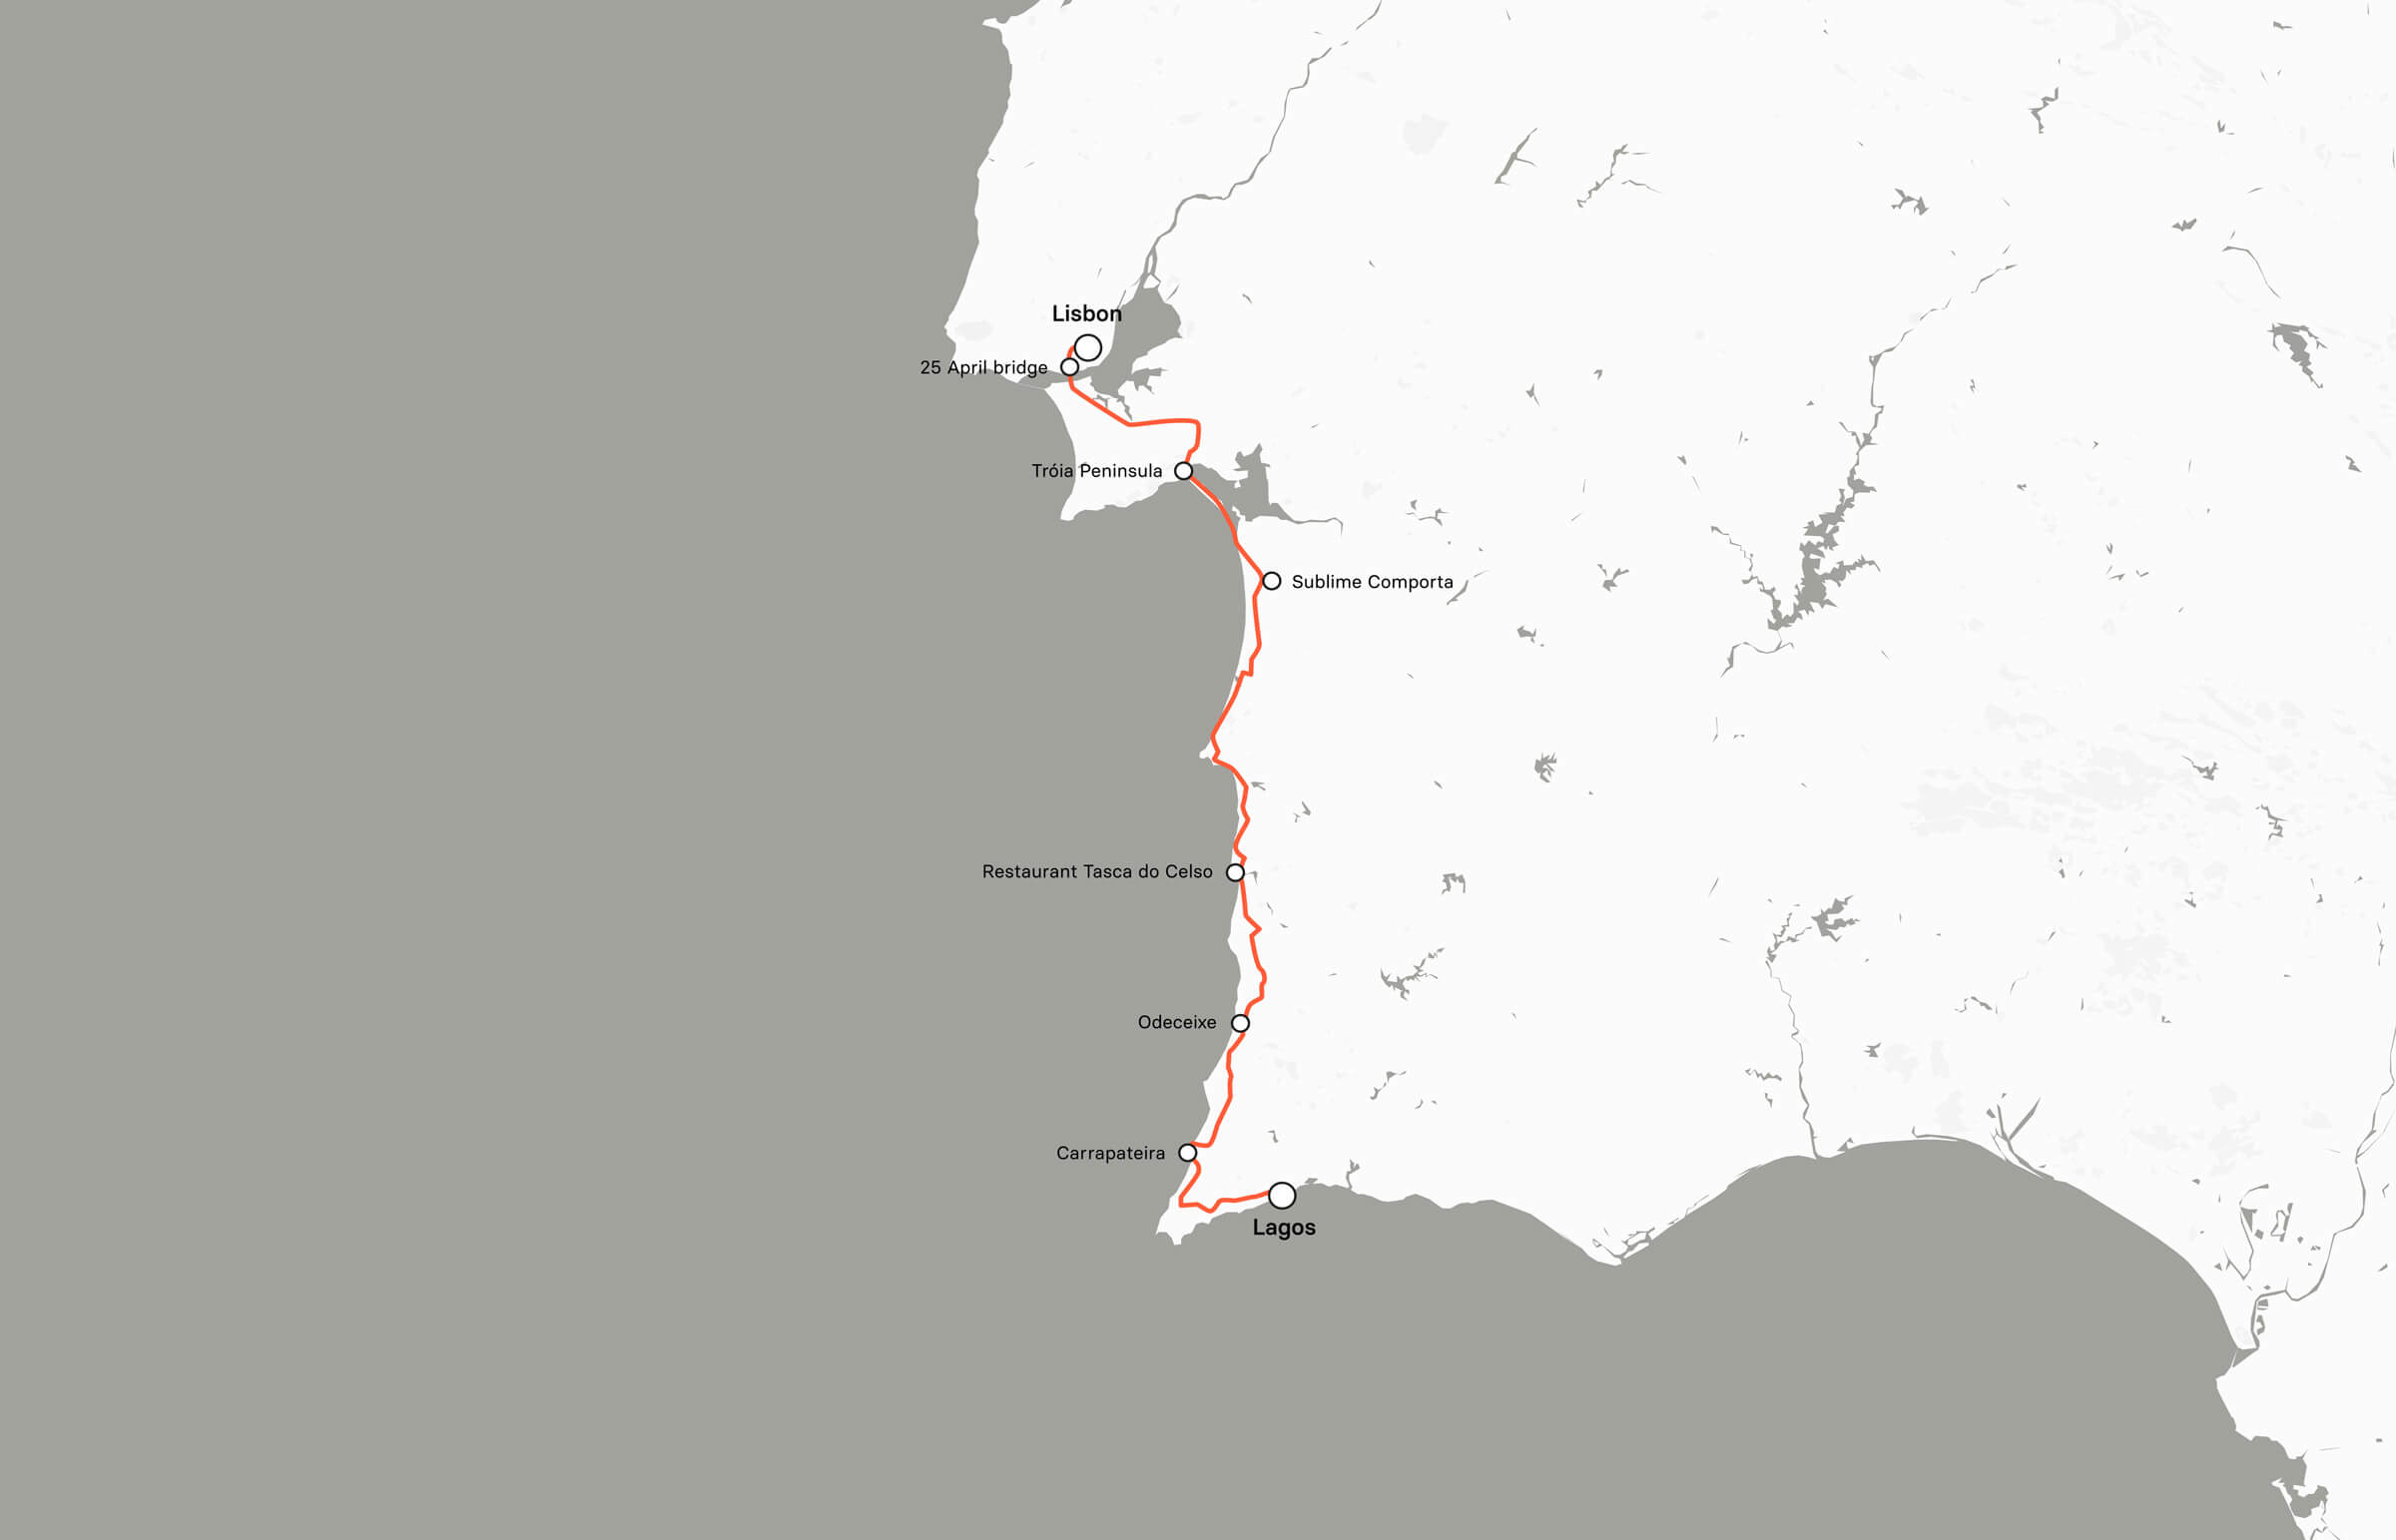 The Atlantic coast of Portugal